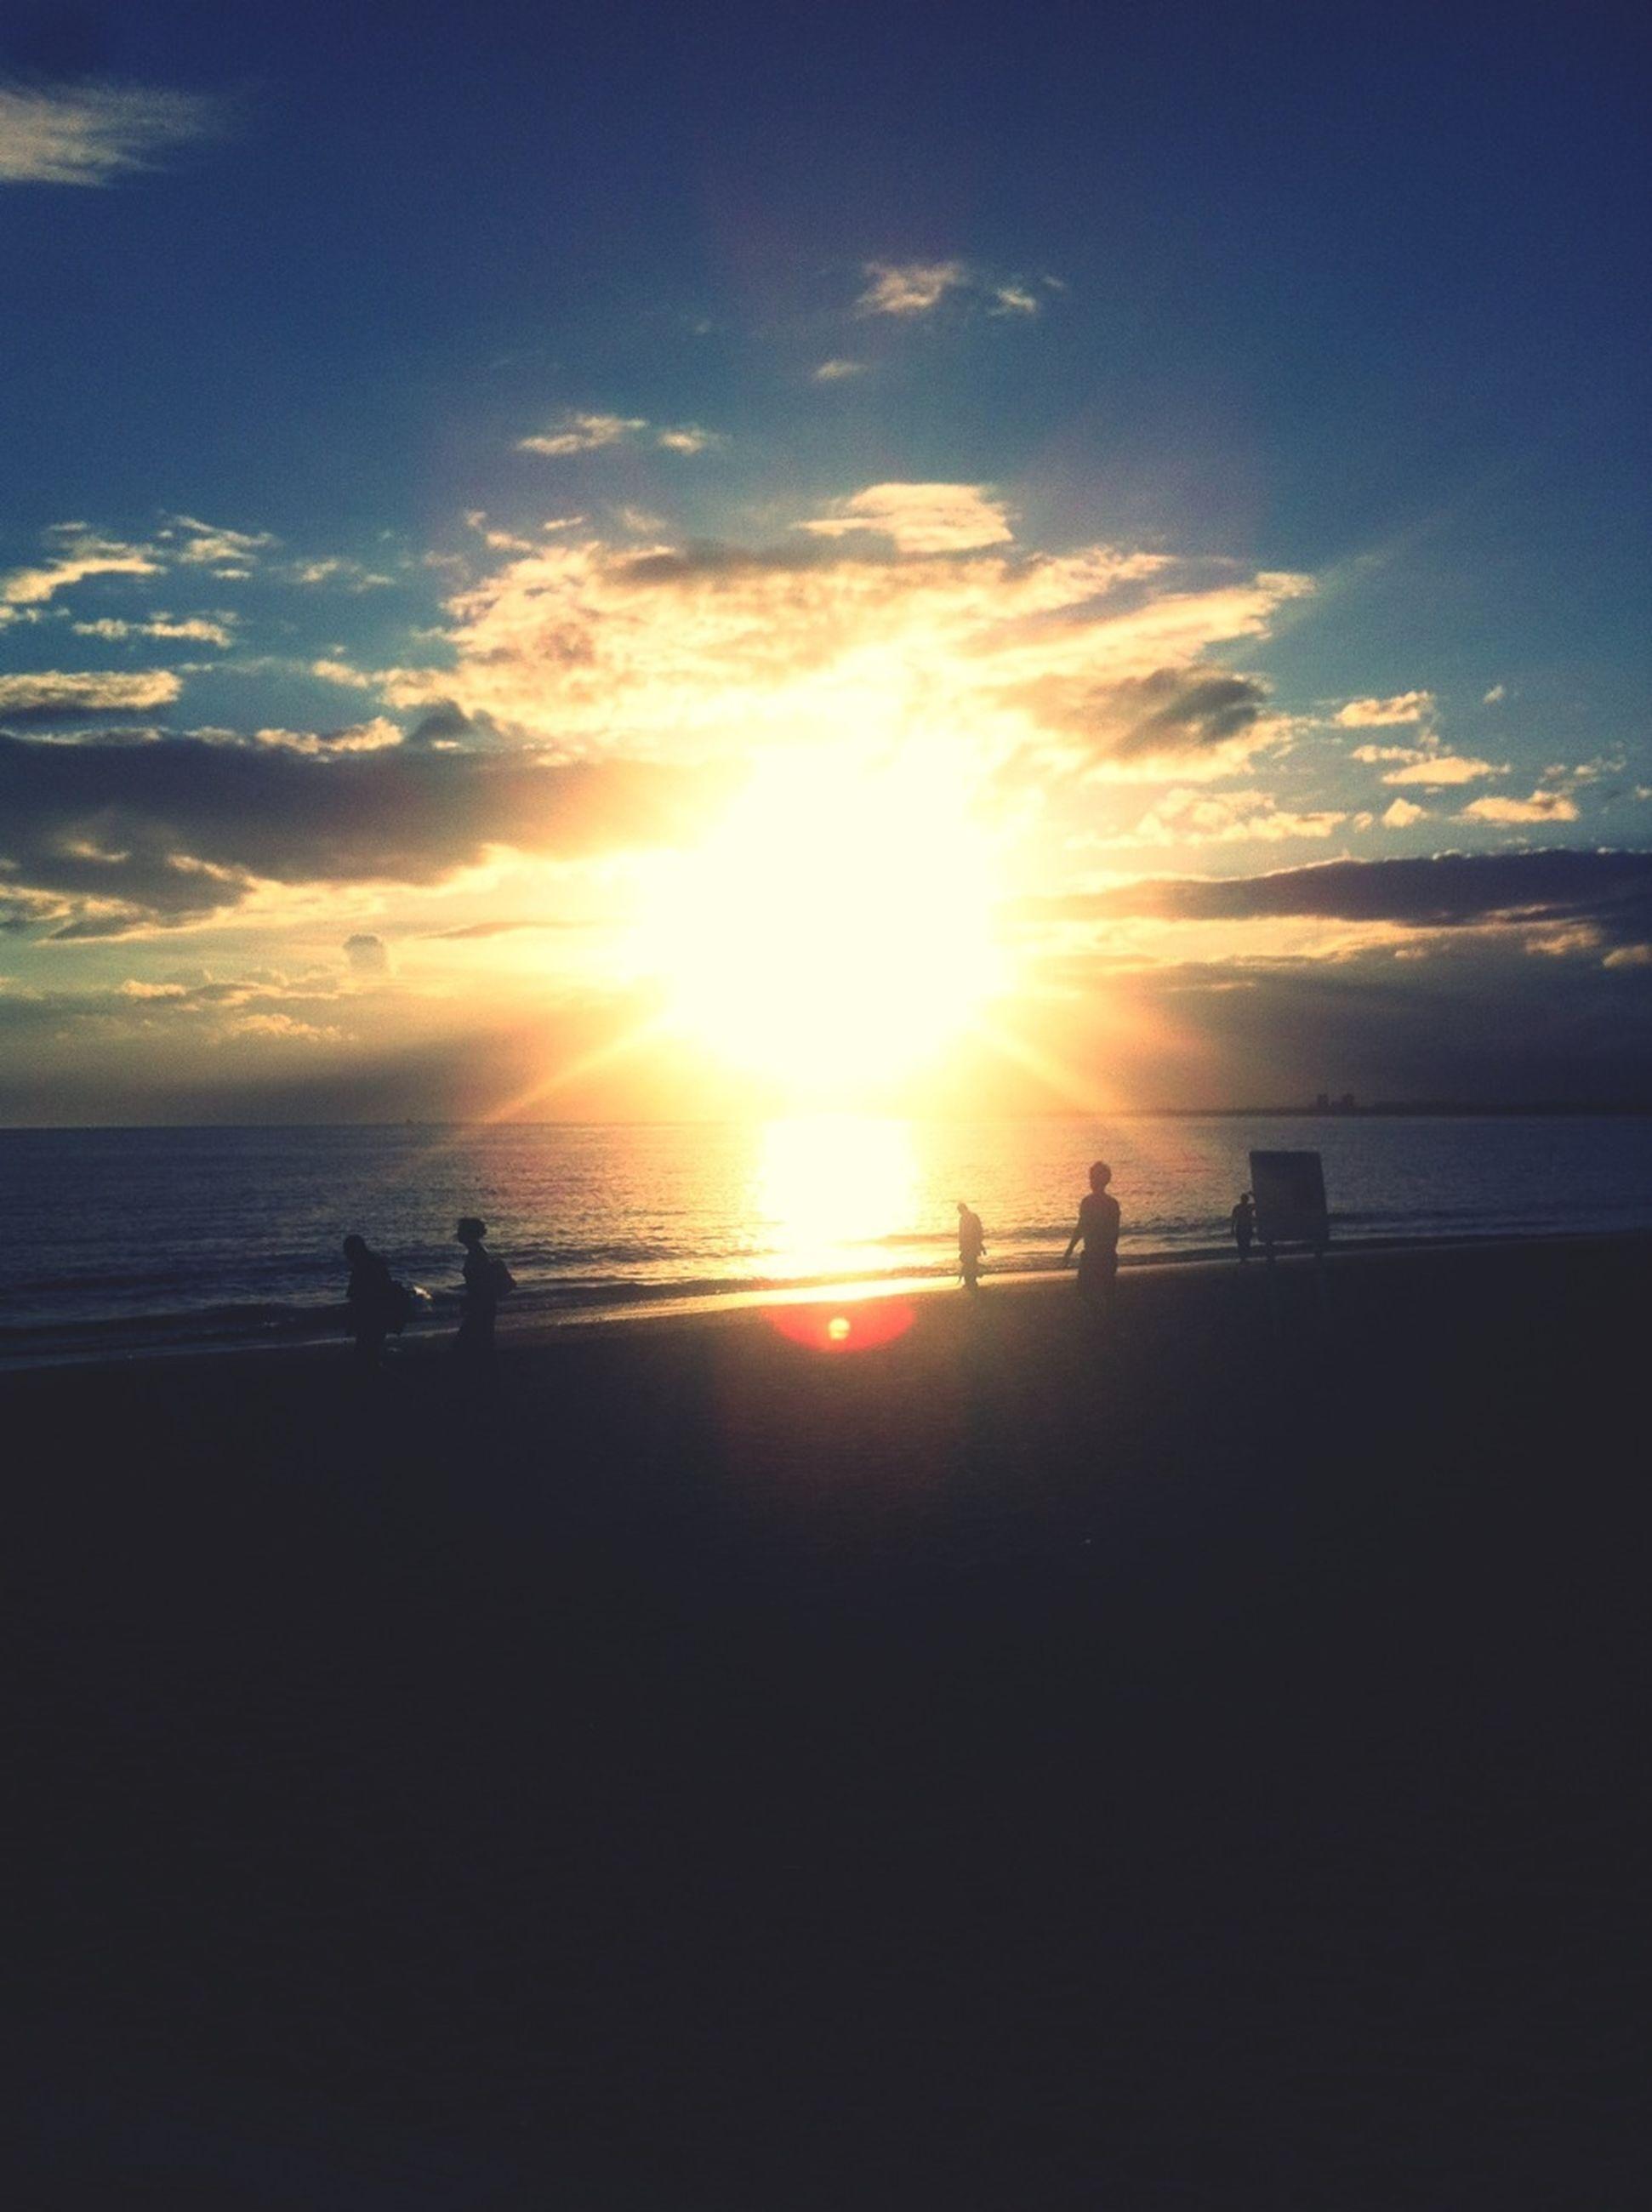 sea, sunset, horizon over water, silhouette, sun, water, beach, sky, scenics, beauty in nature, tranquil scene, tranquility, shore, sunlight, leisure activity, men, nature, lifestyles, idyllic